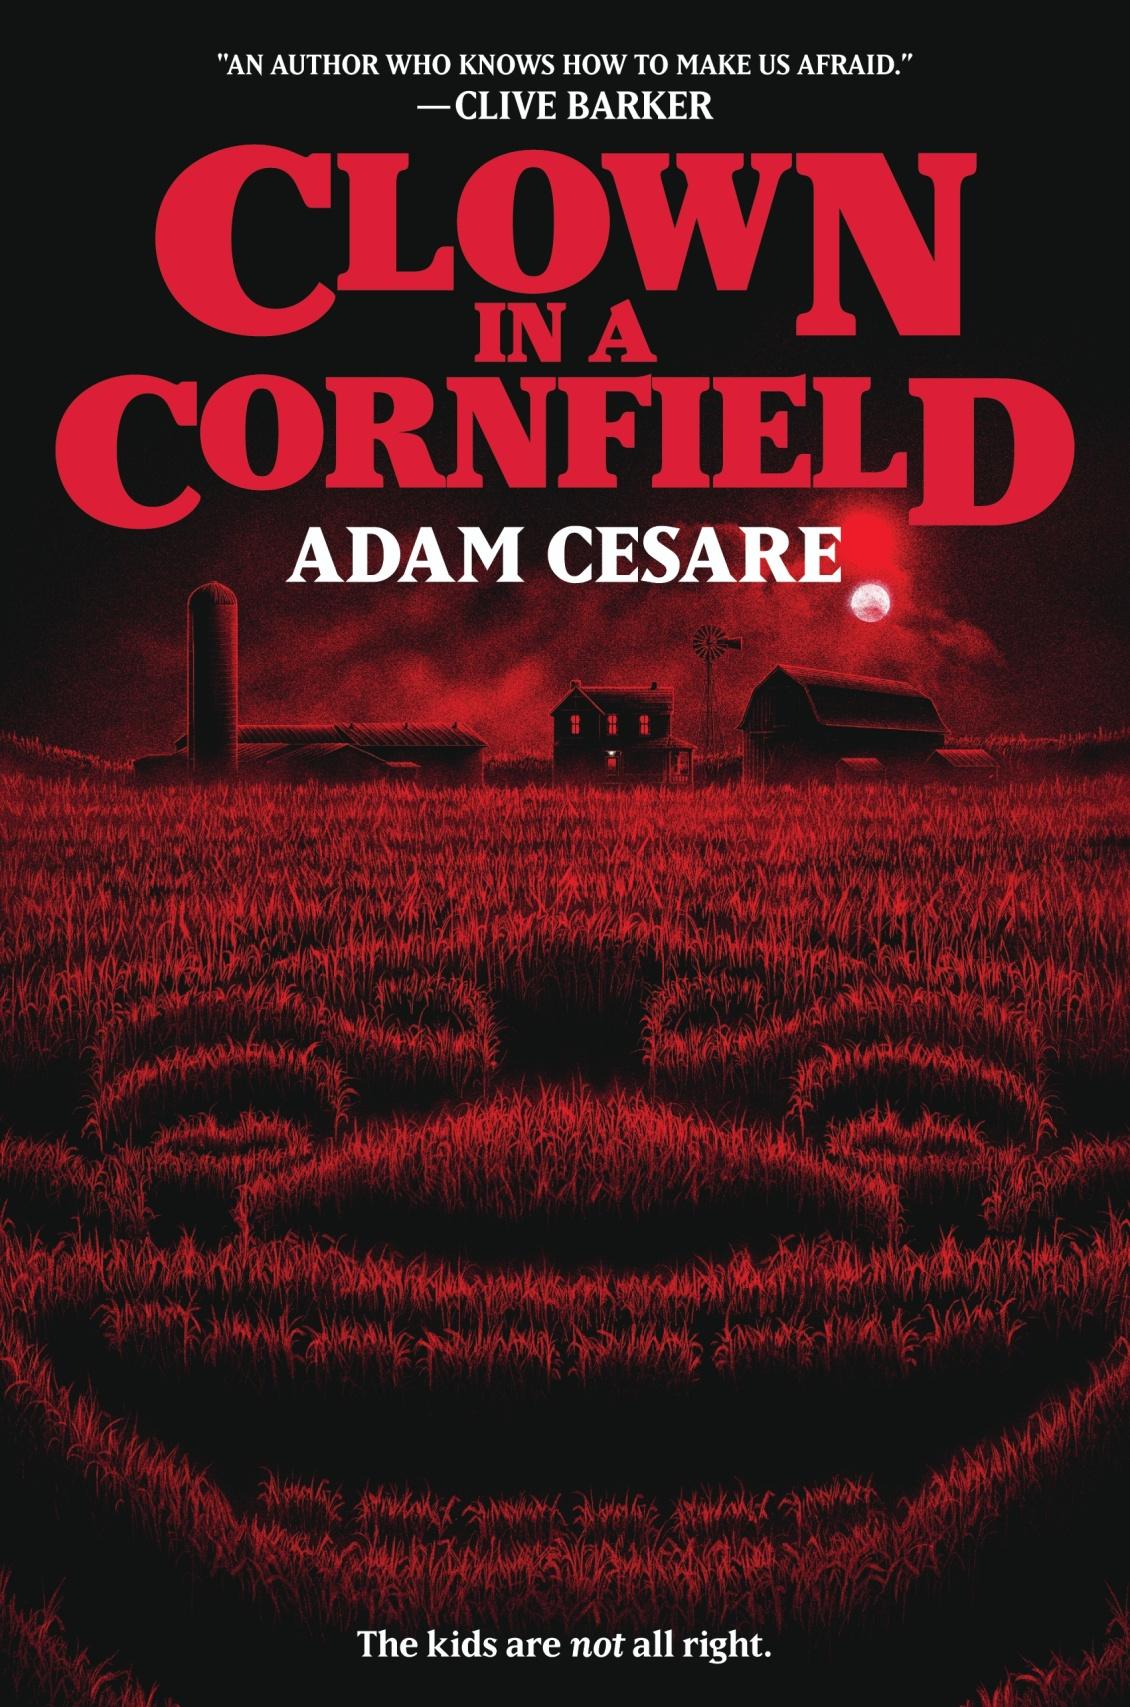 ClownCornfield-hc (1).jpg